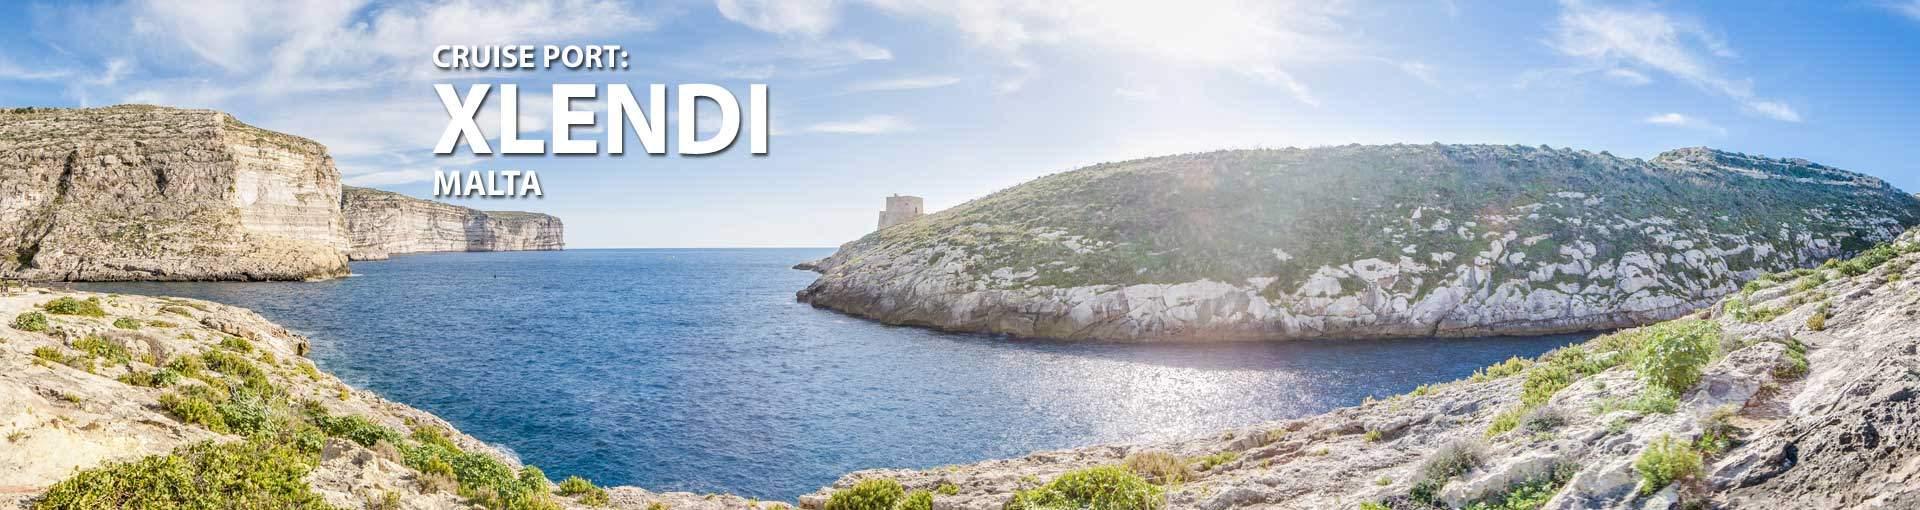 Cruises to Xlendi, Malta